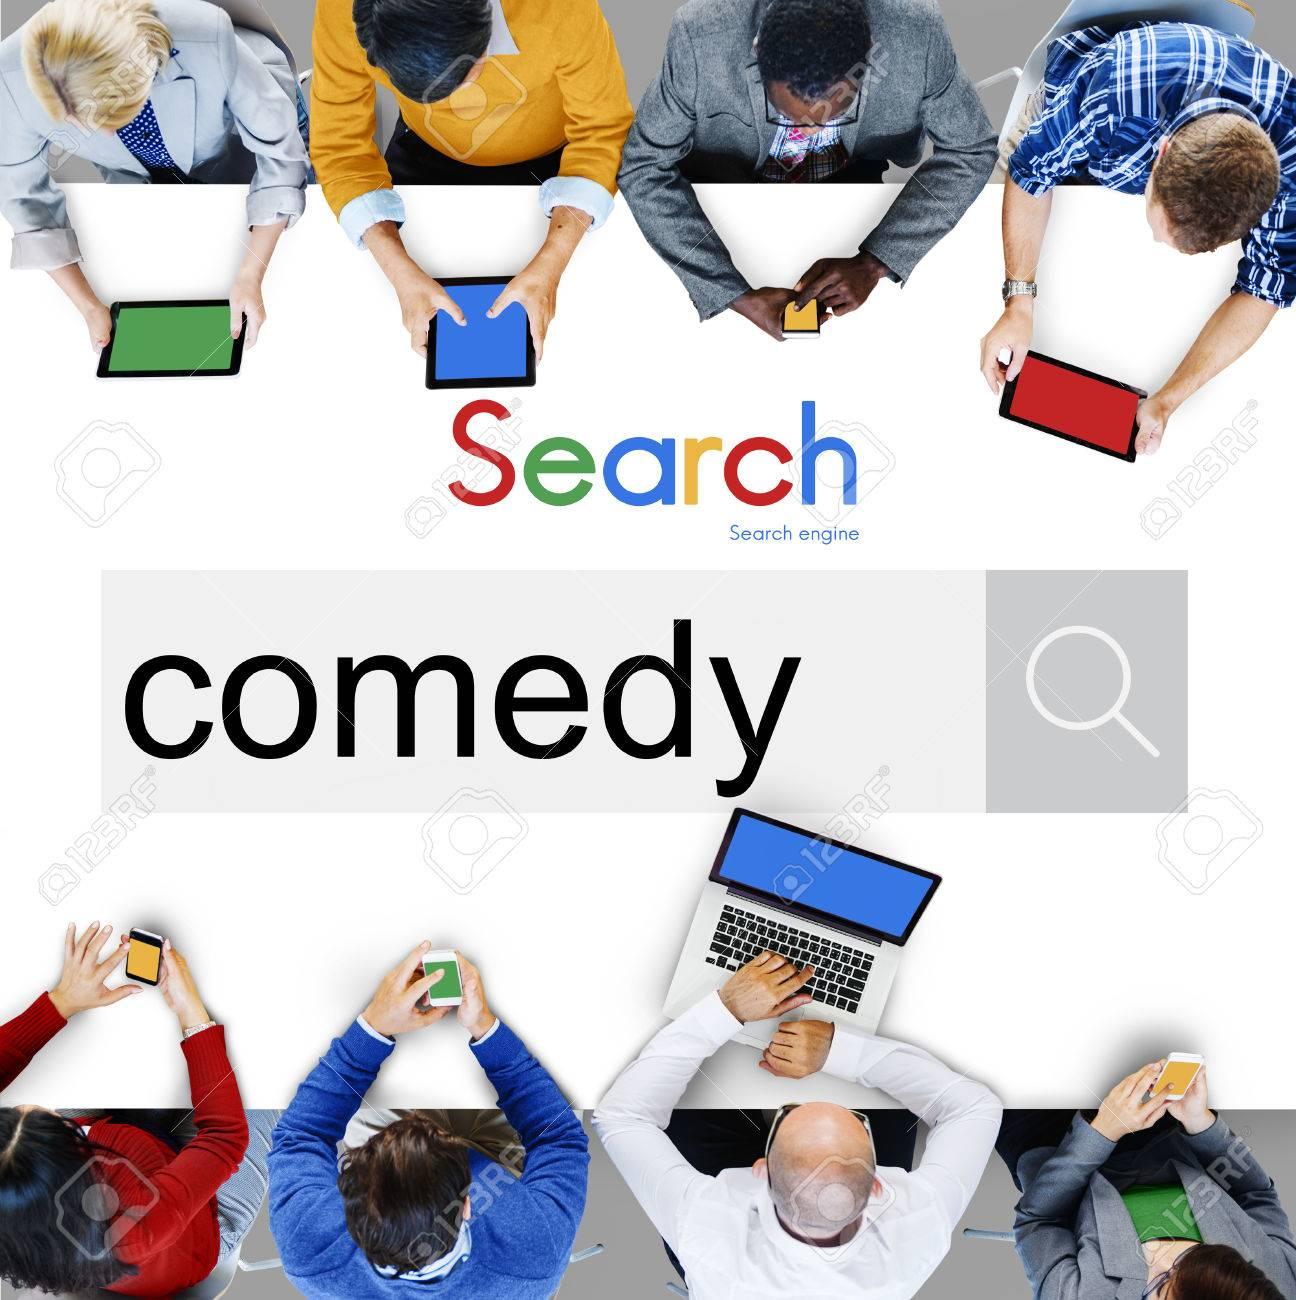 Comedy Fun Happiness Amusement Satire Cheerful Concept Stock Photo